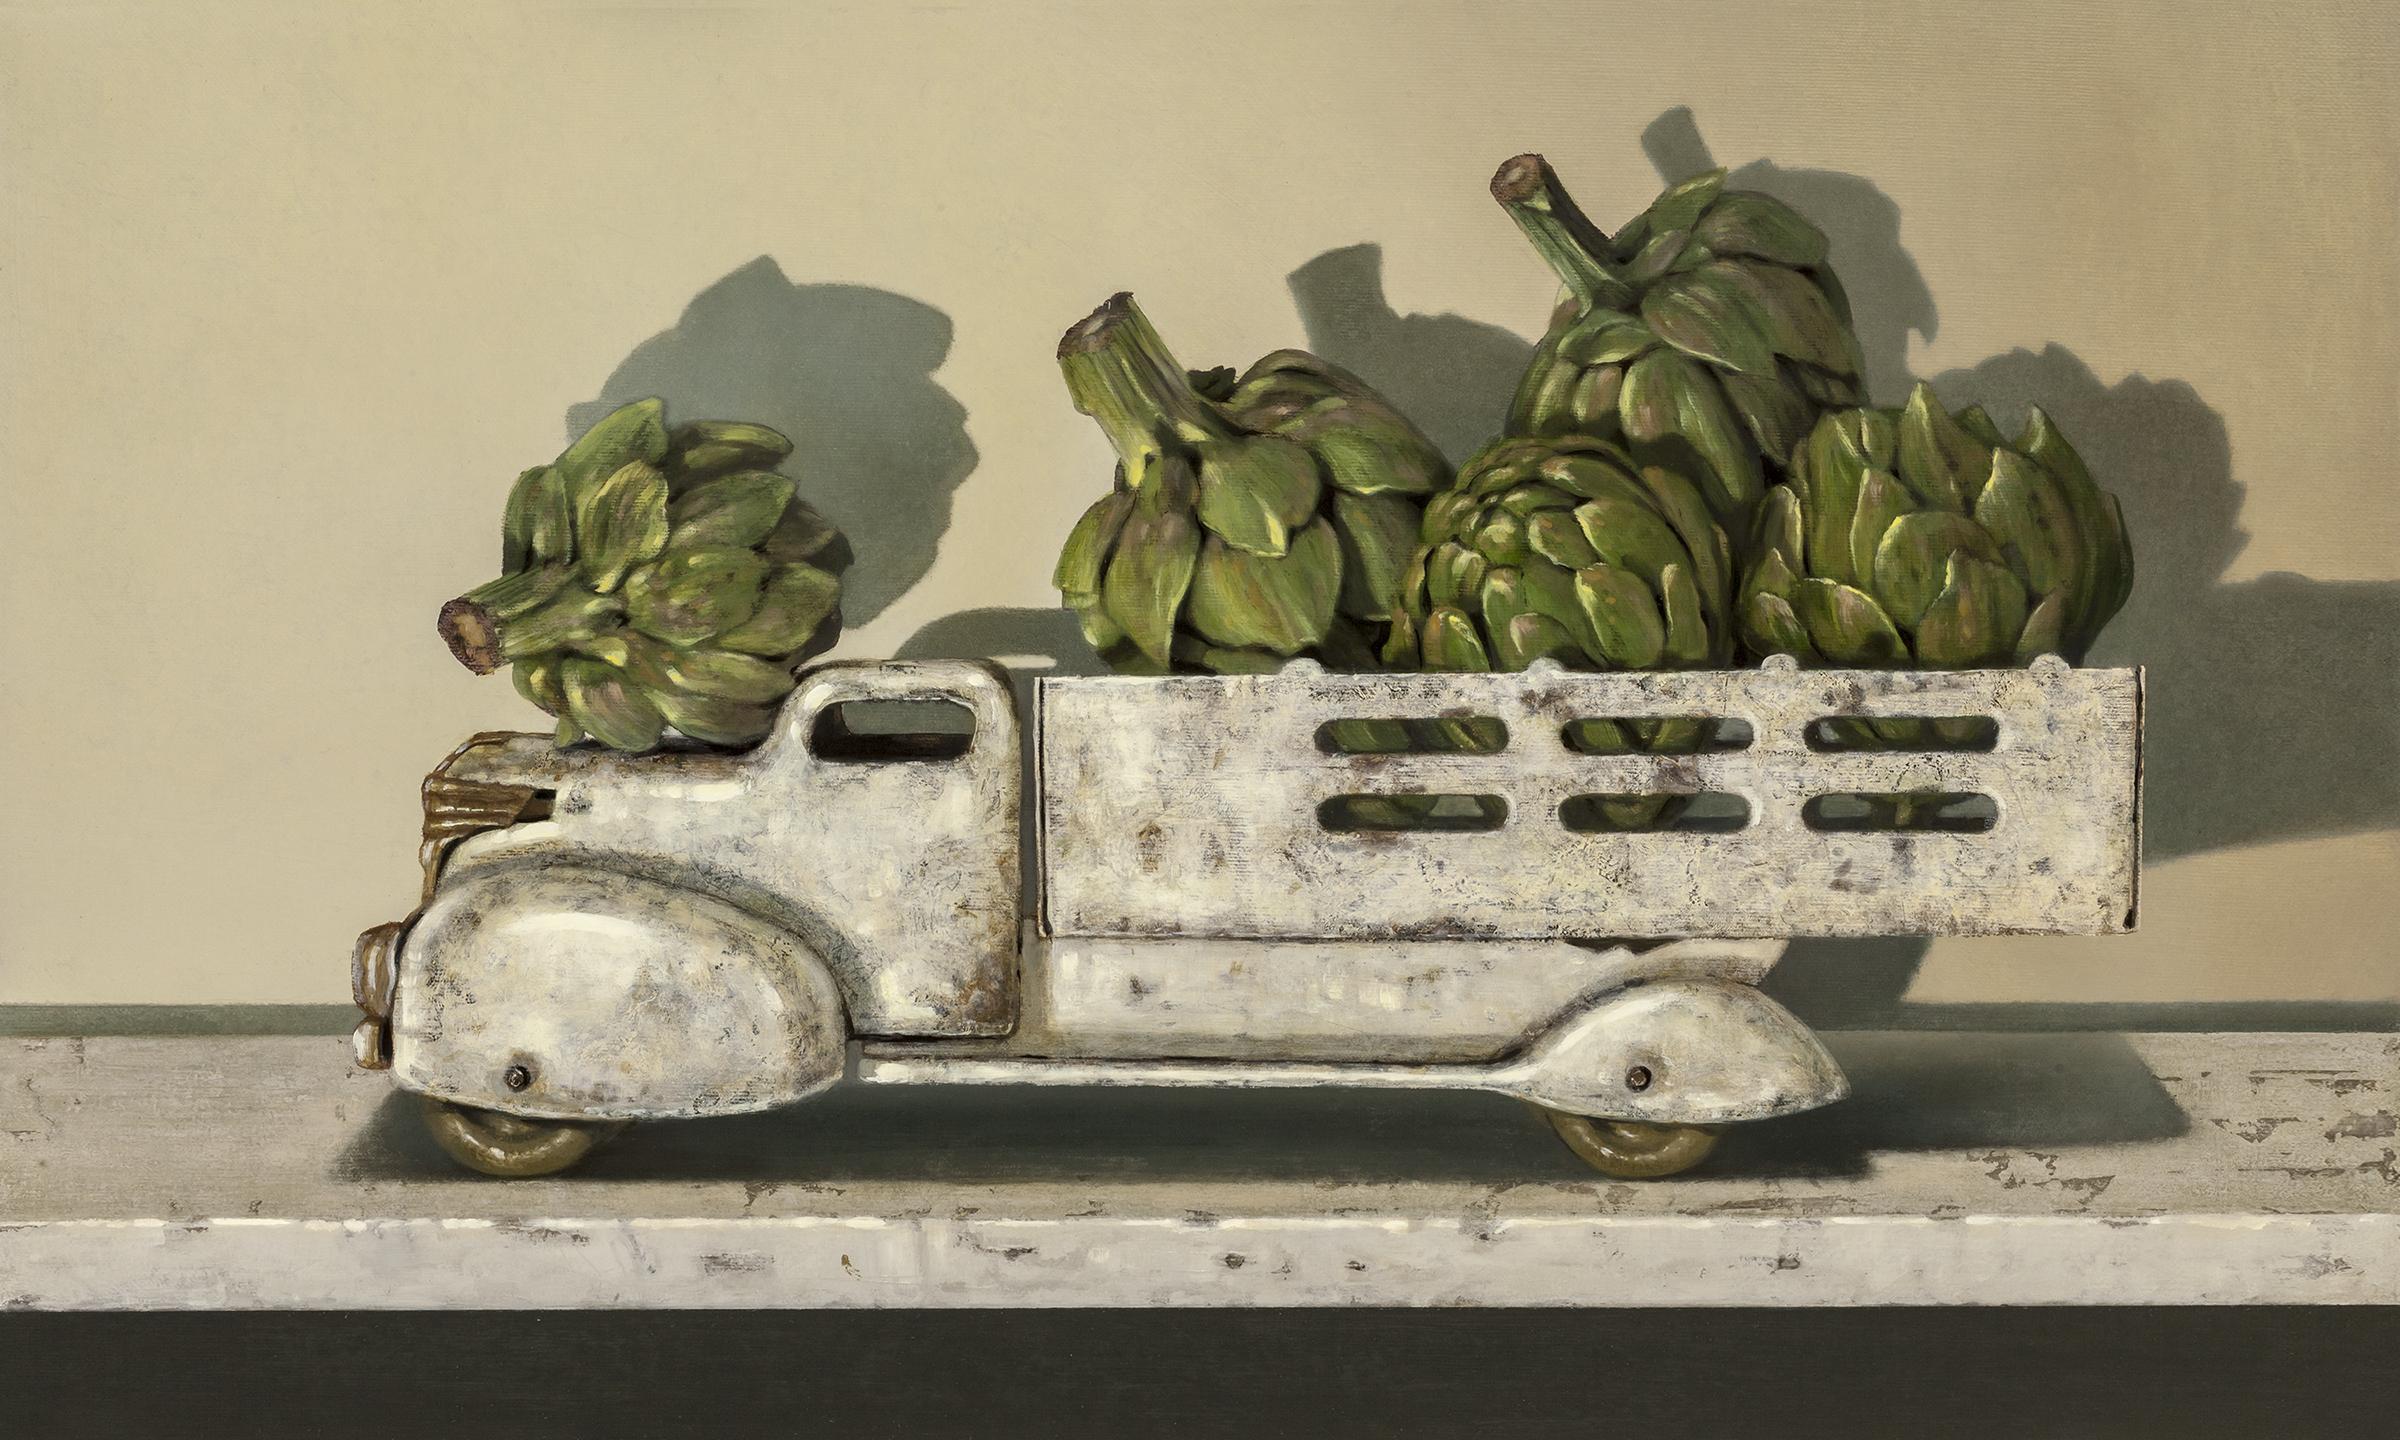 Oil painter Richard Hall